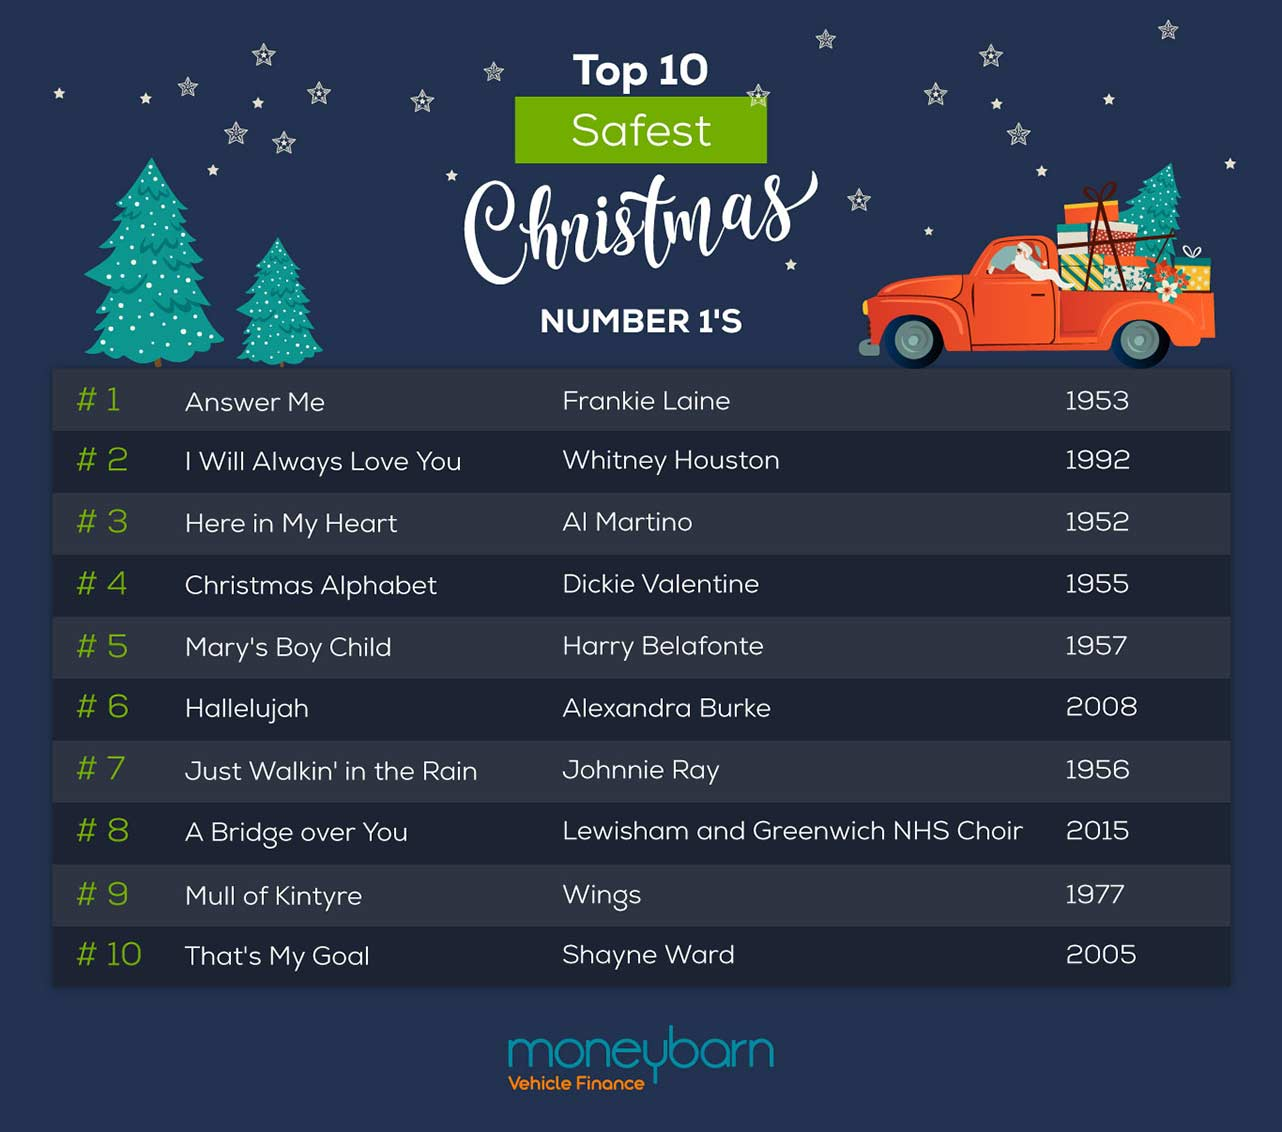 Safest Christmas Number 1's